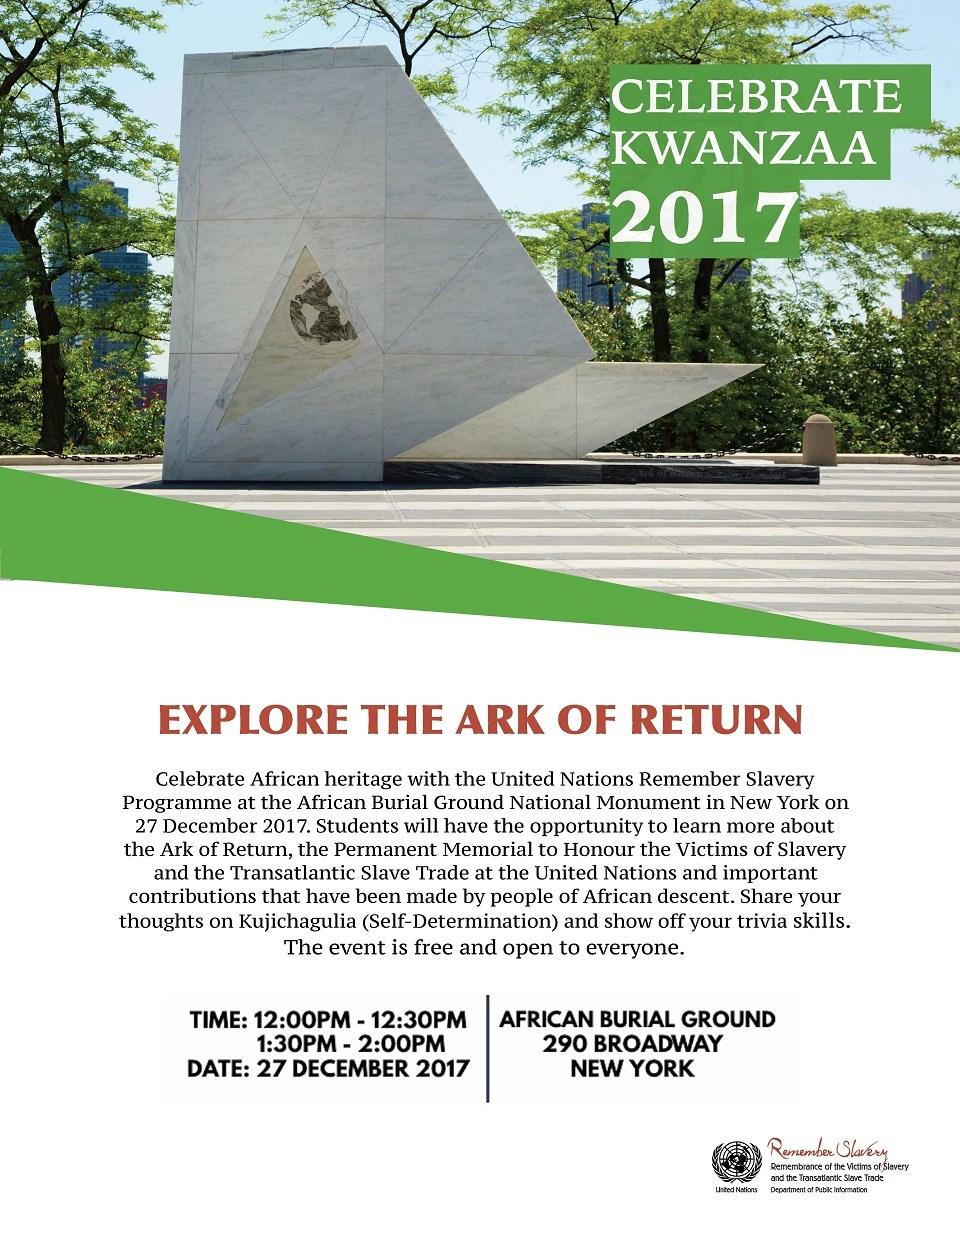 celebrating kwanzaa african burial ground national monument u s